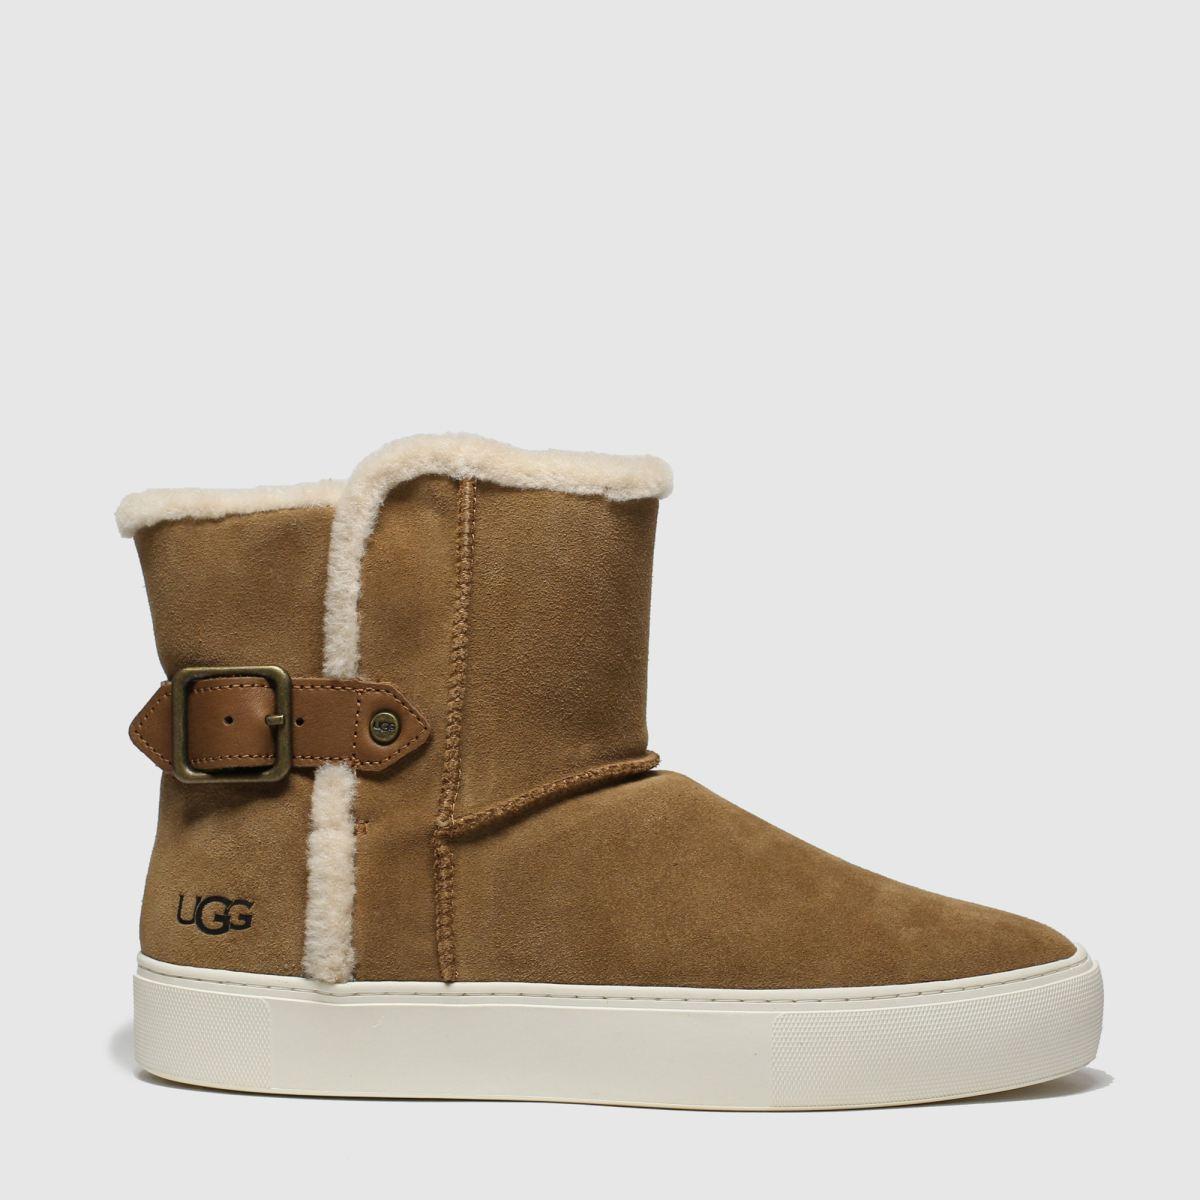 Ugg Tan Akia Boots